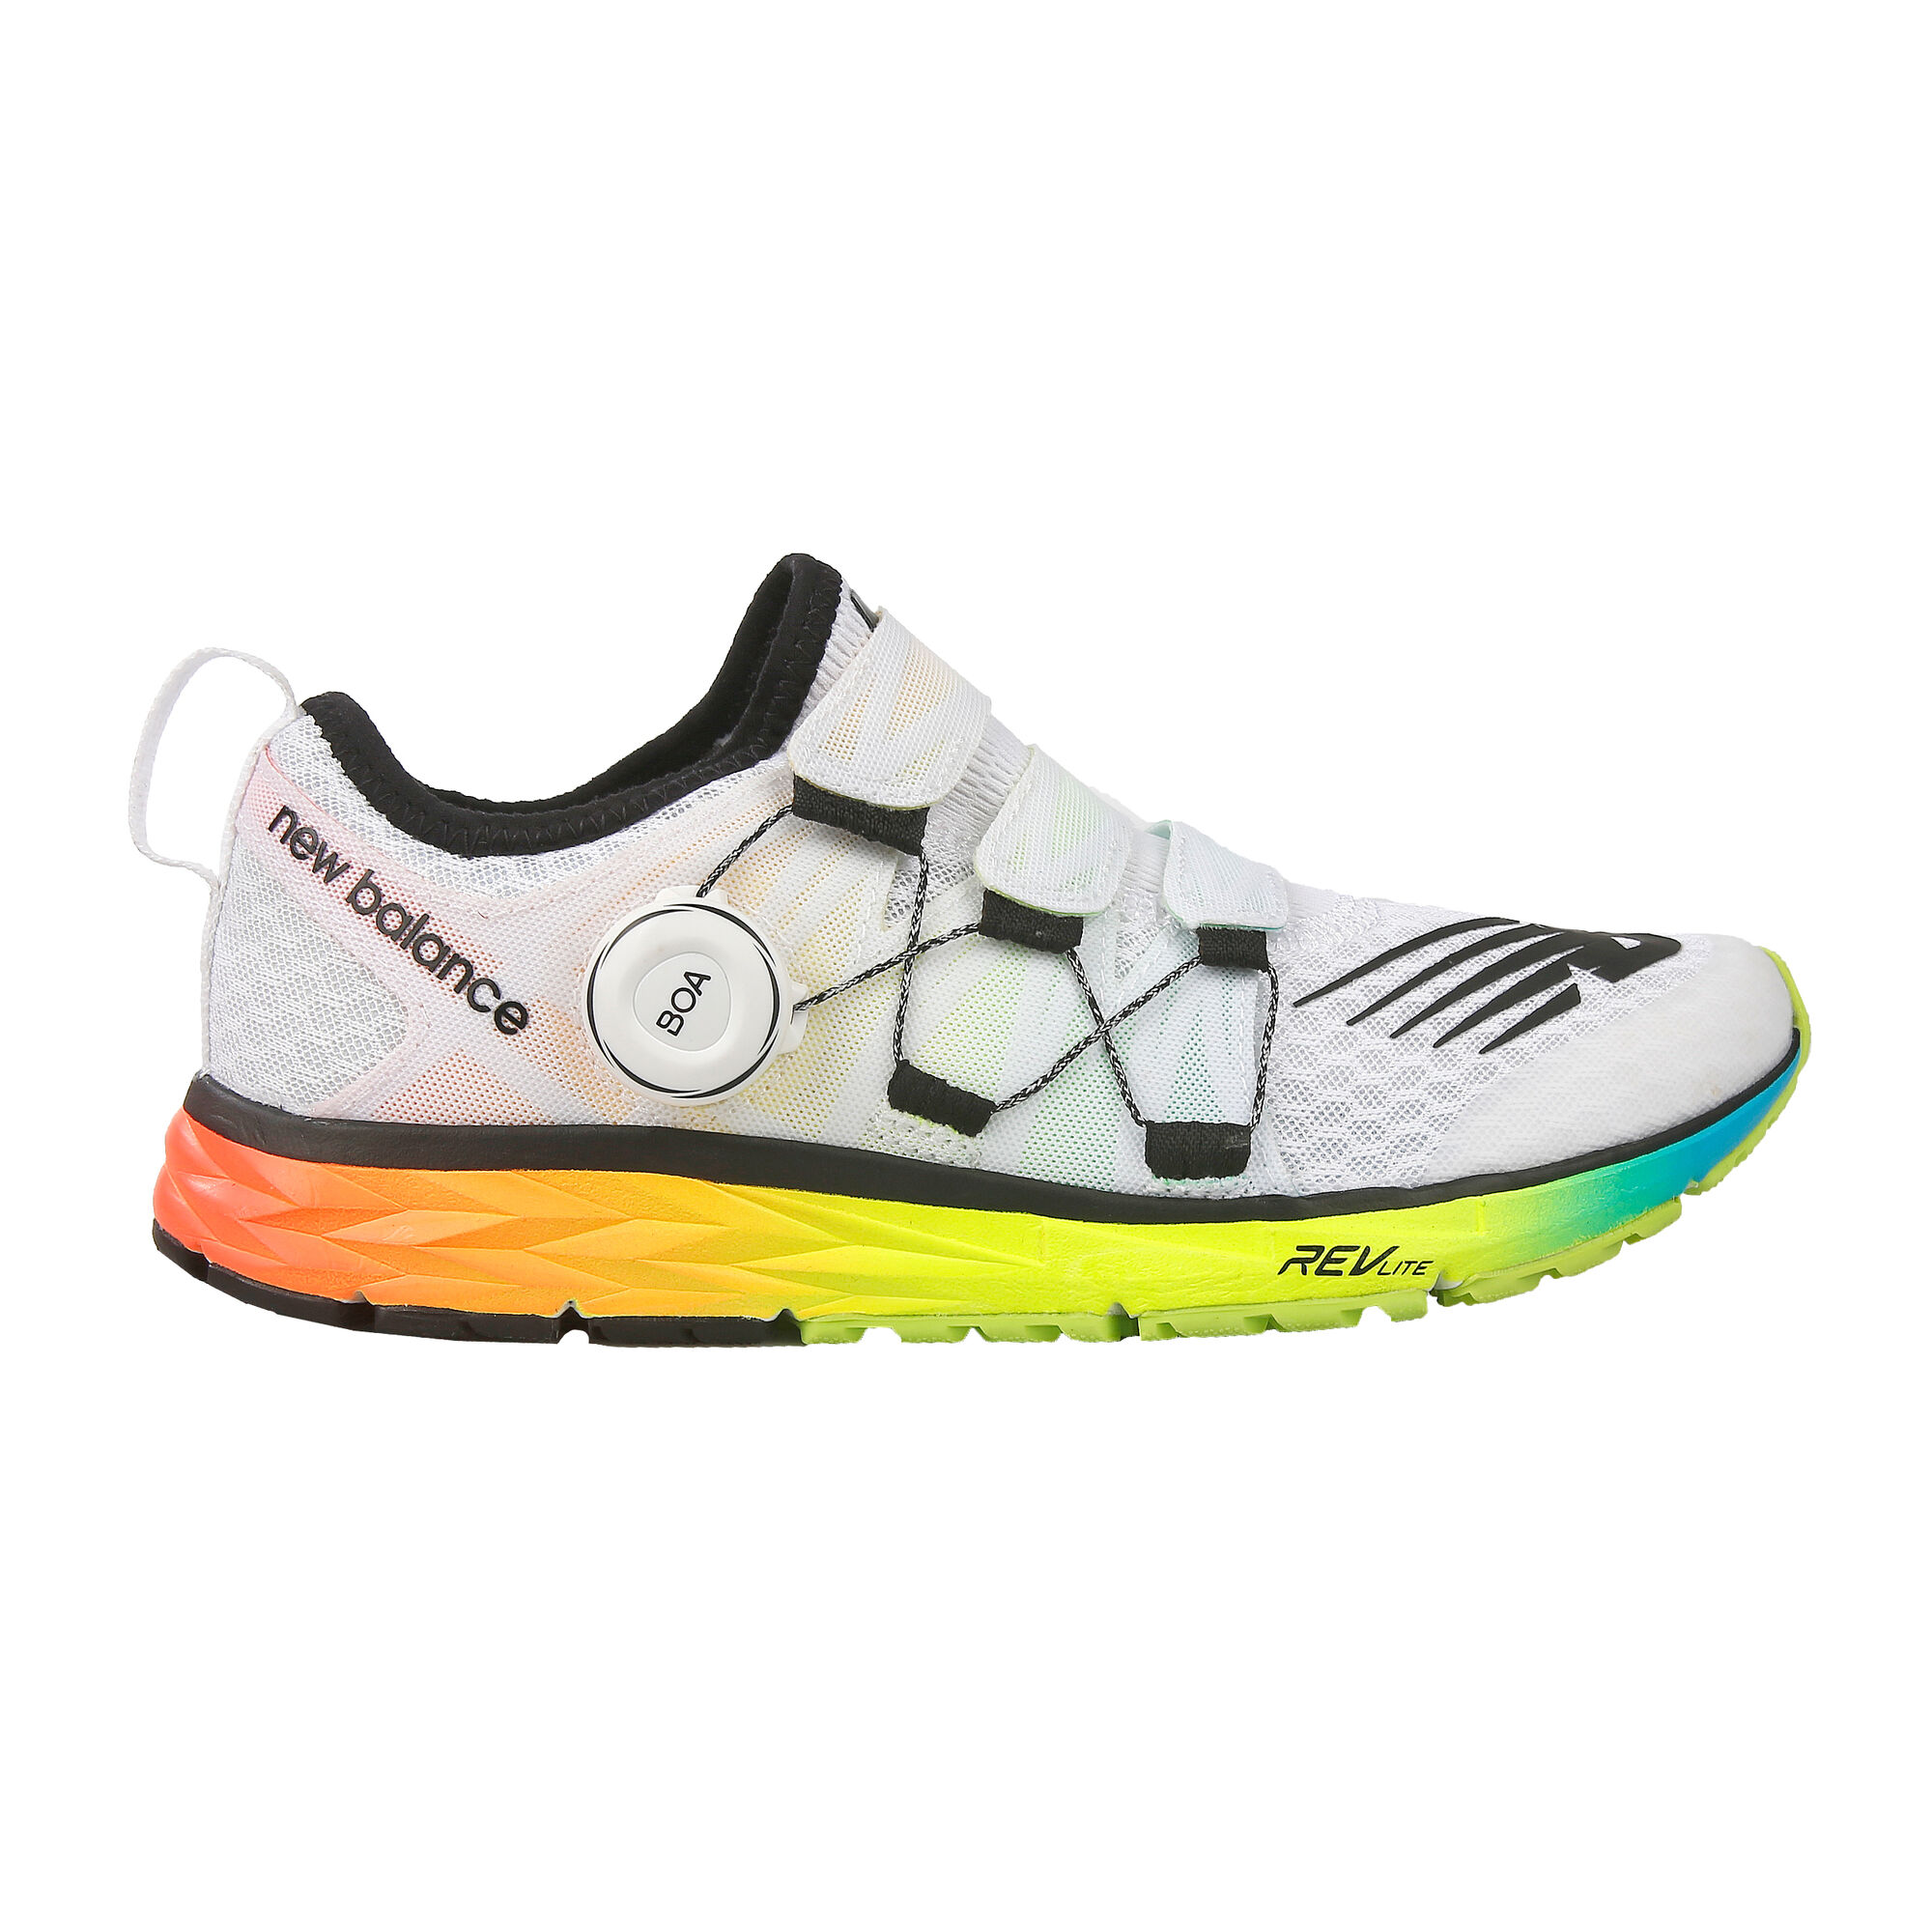 sale retailer 2c330 cb765 buy New Balance Race 1500 V4 BOA Competition Running Shoe ...